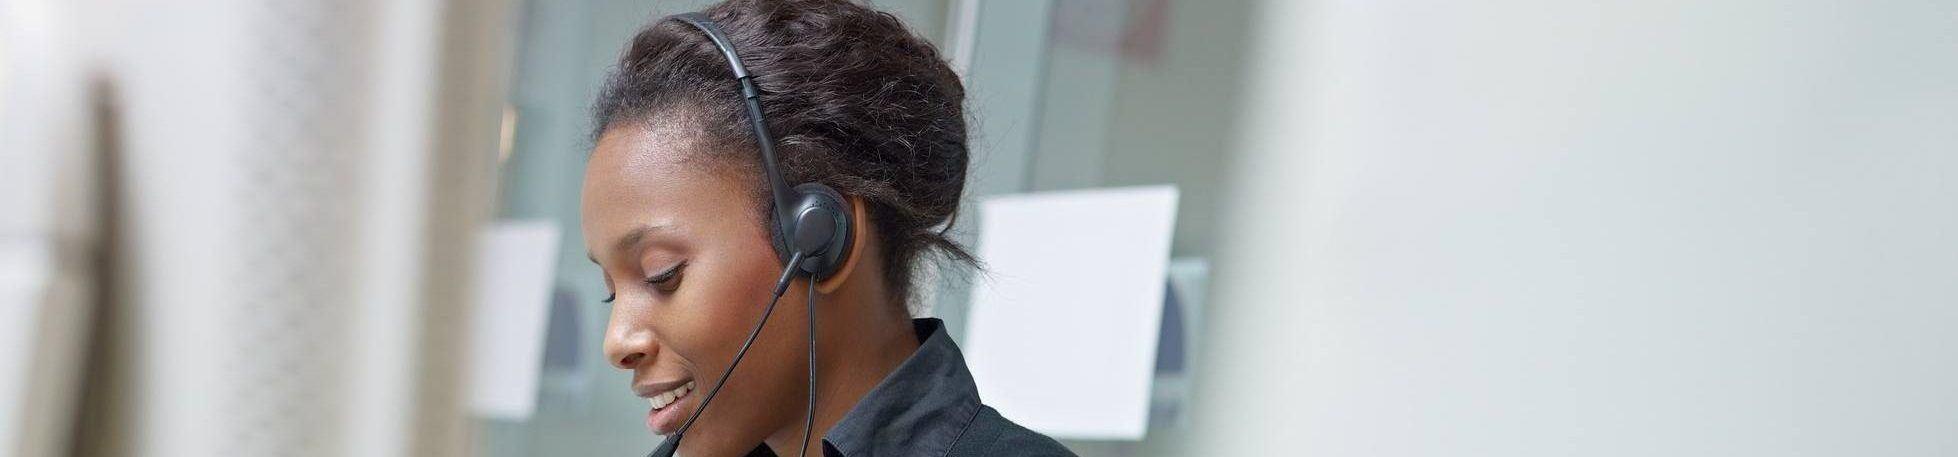 Telepone skills and etiquette training